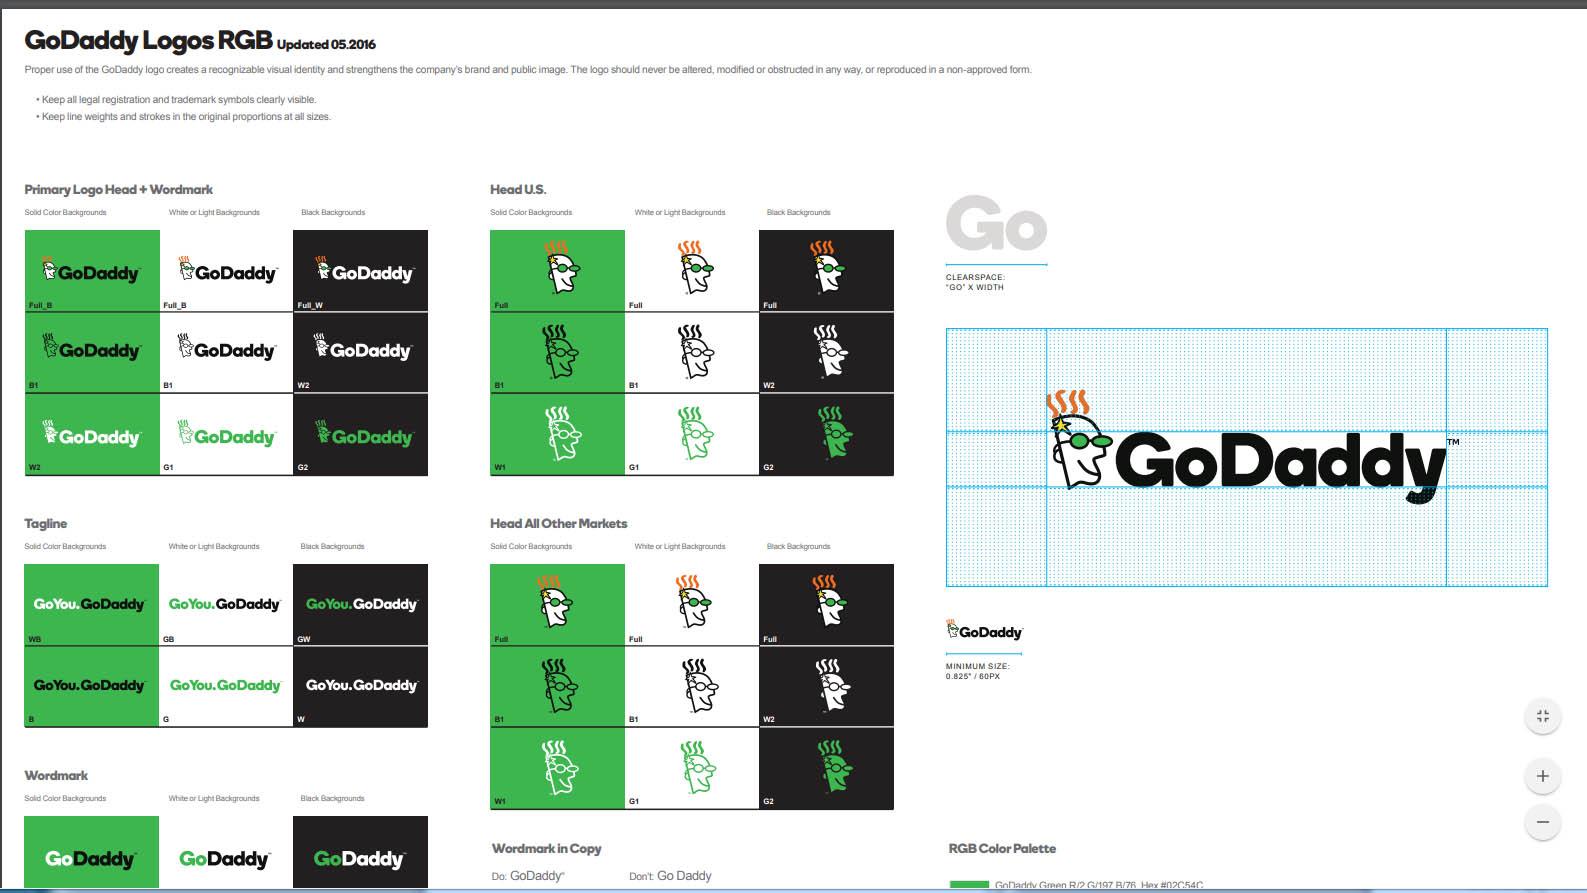 GoDaddy logos